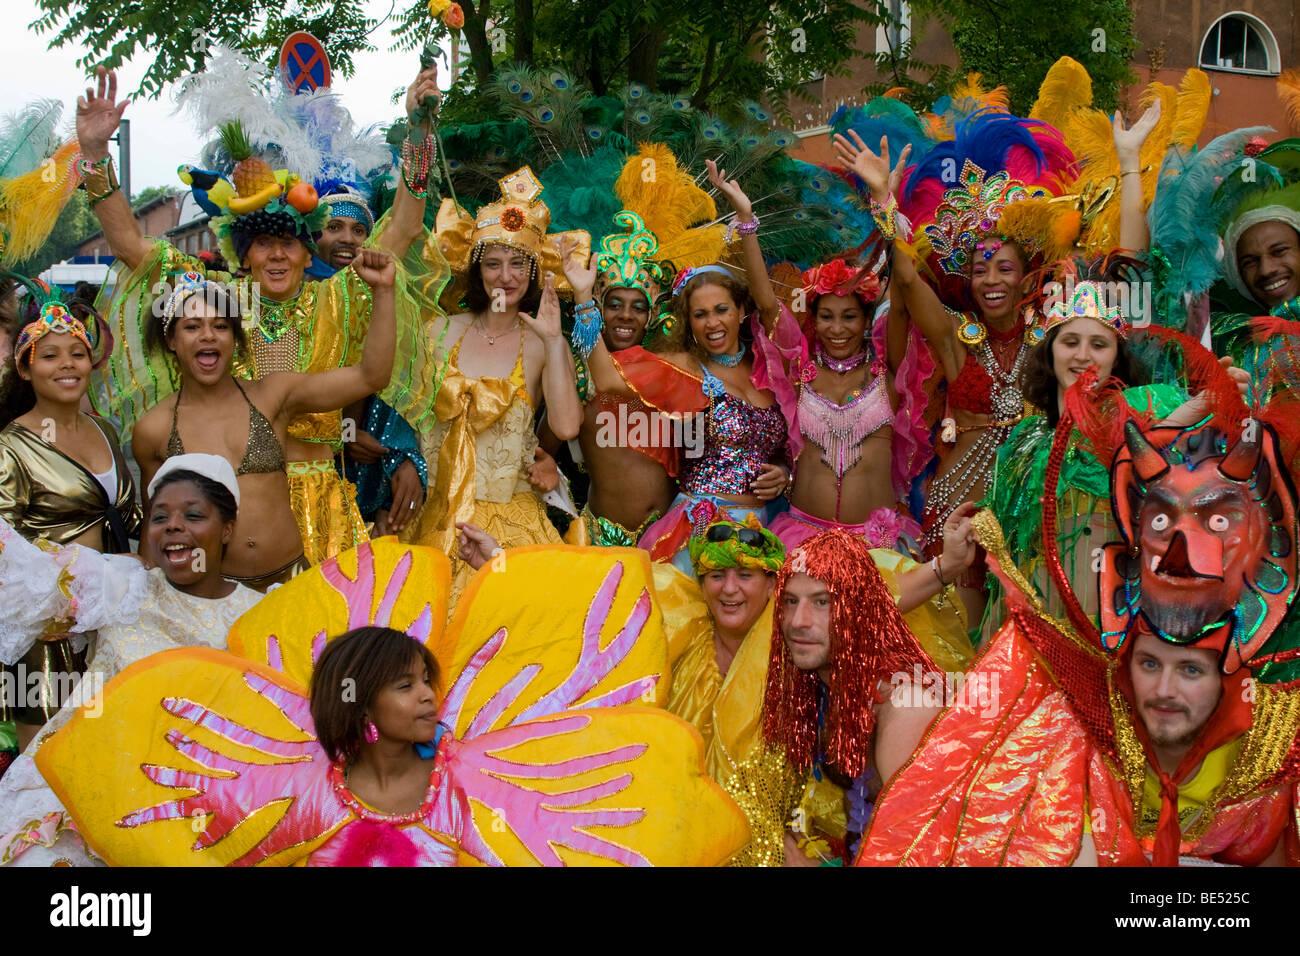 Amasonia Gruppe, Karneval der Kulturen 2009, Berlin, Deutschland, Europa Stockbild